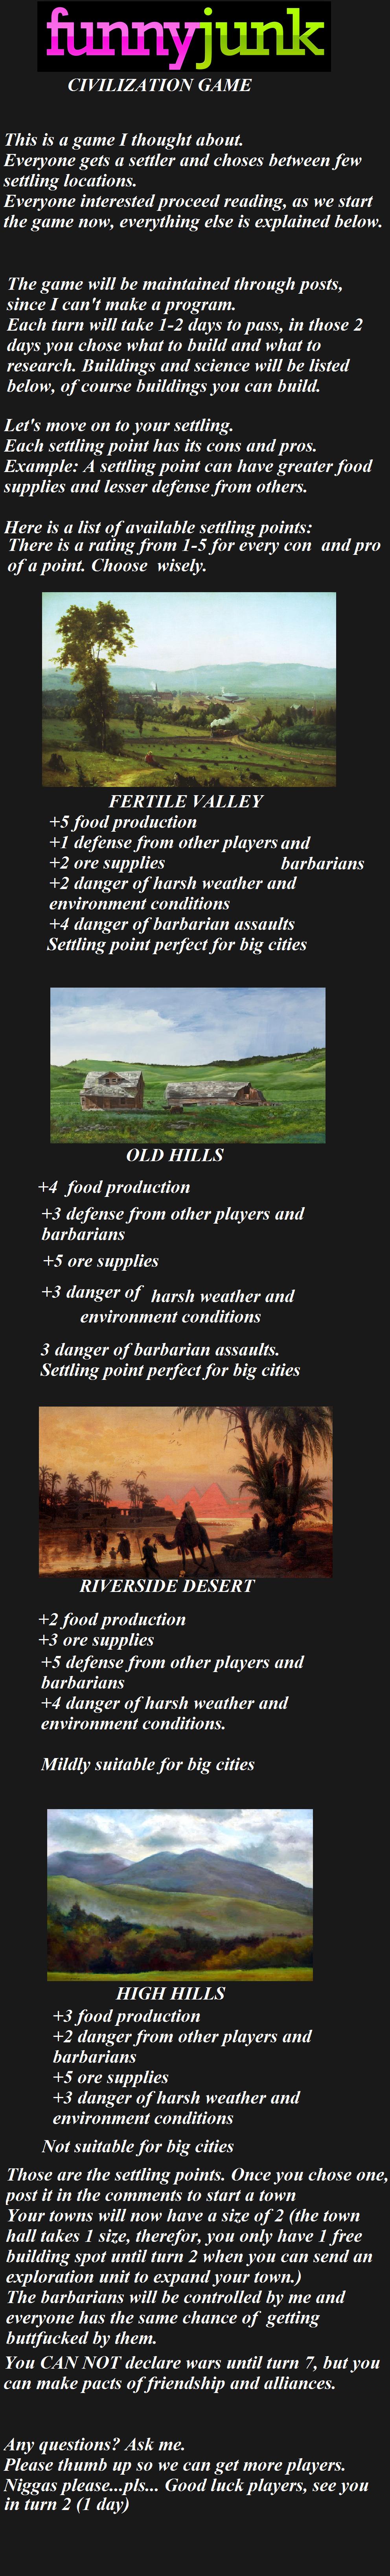 FJ civilization game. .